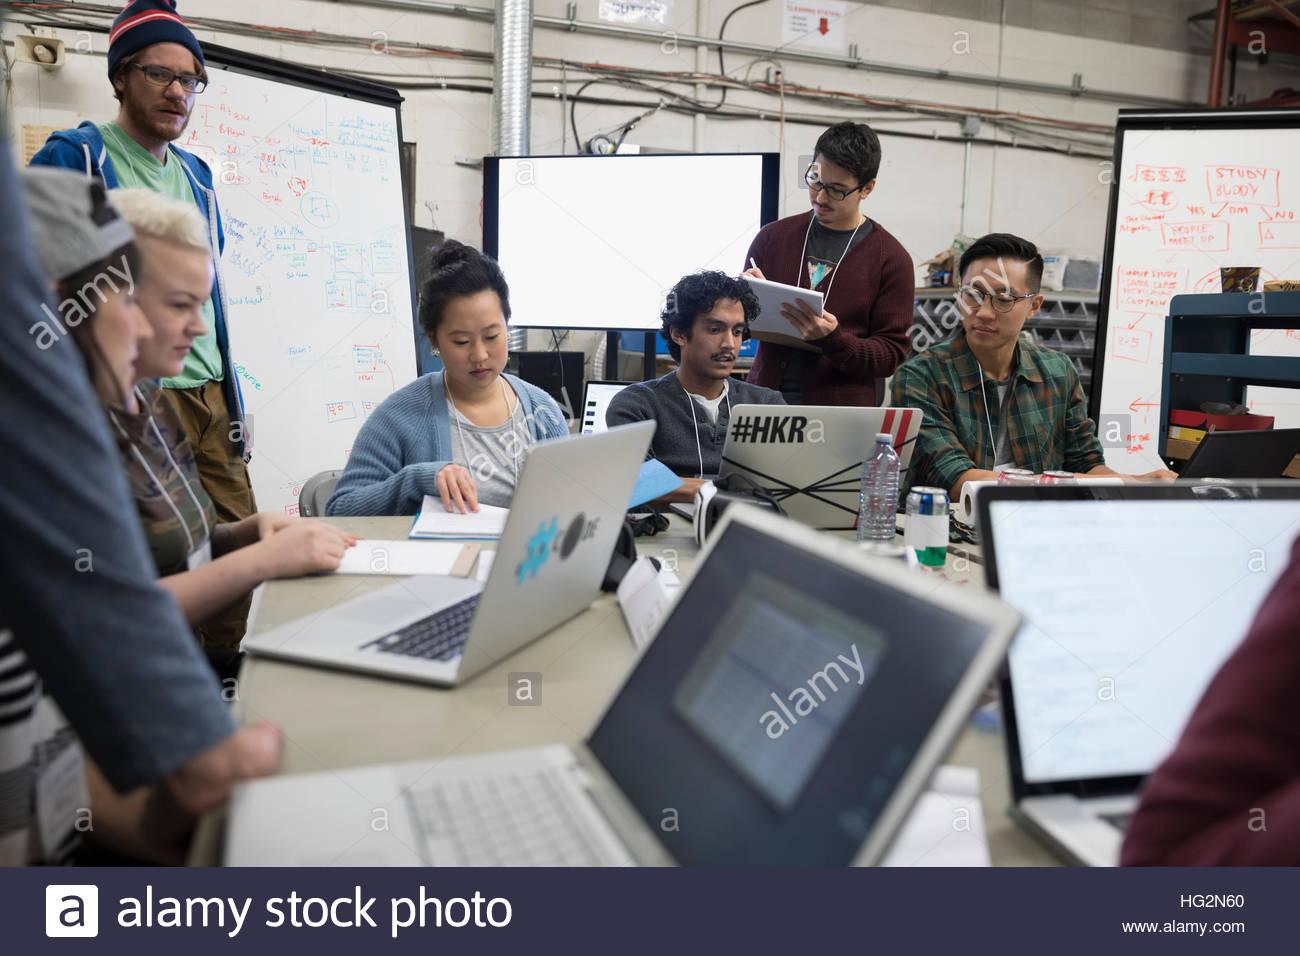 Hackers working hackathon at laptops in workshop - Stock Image